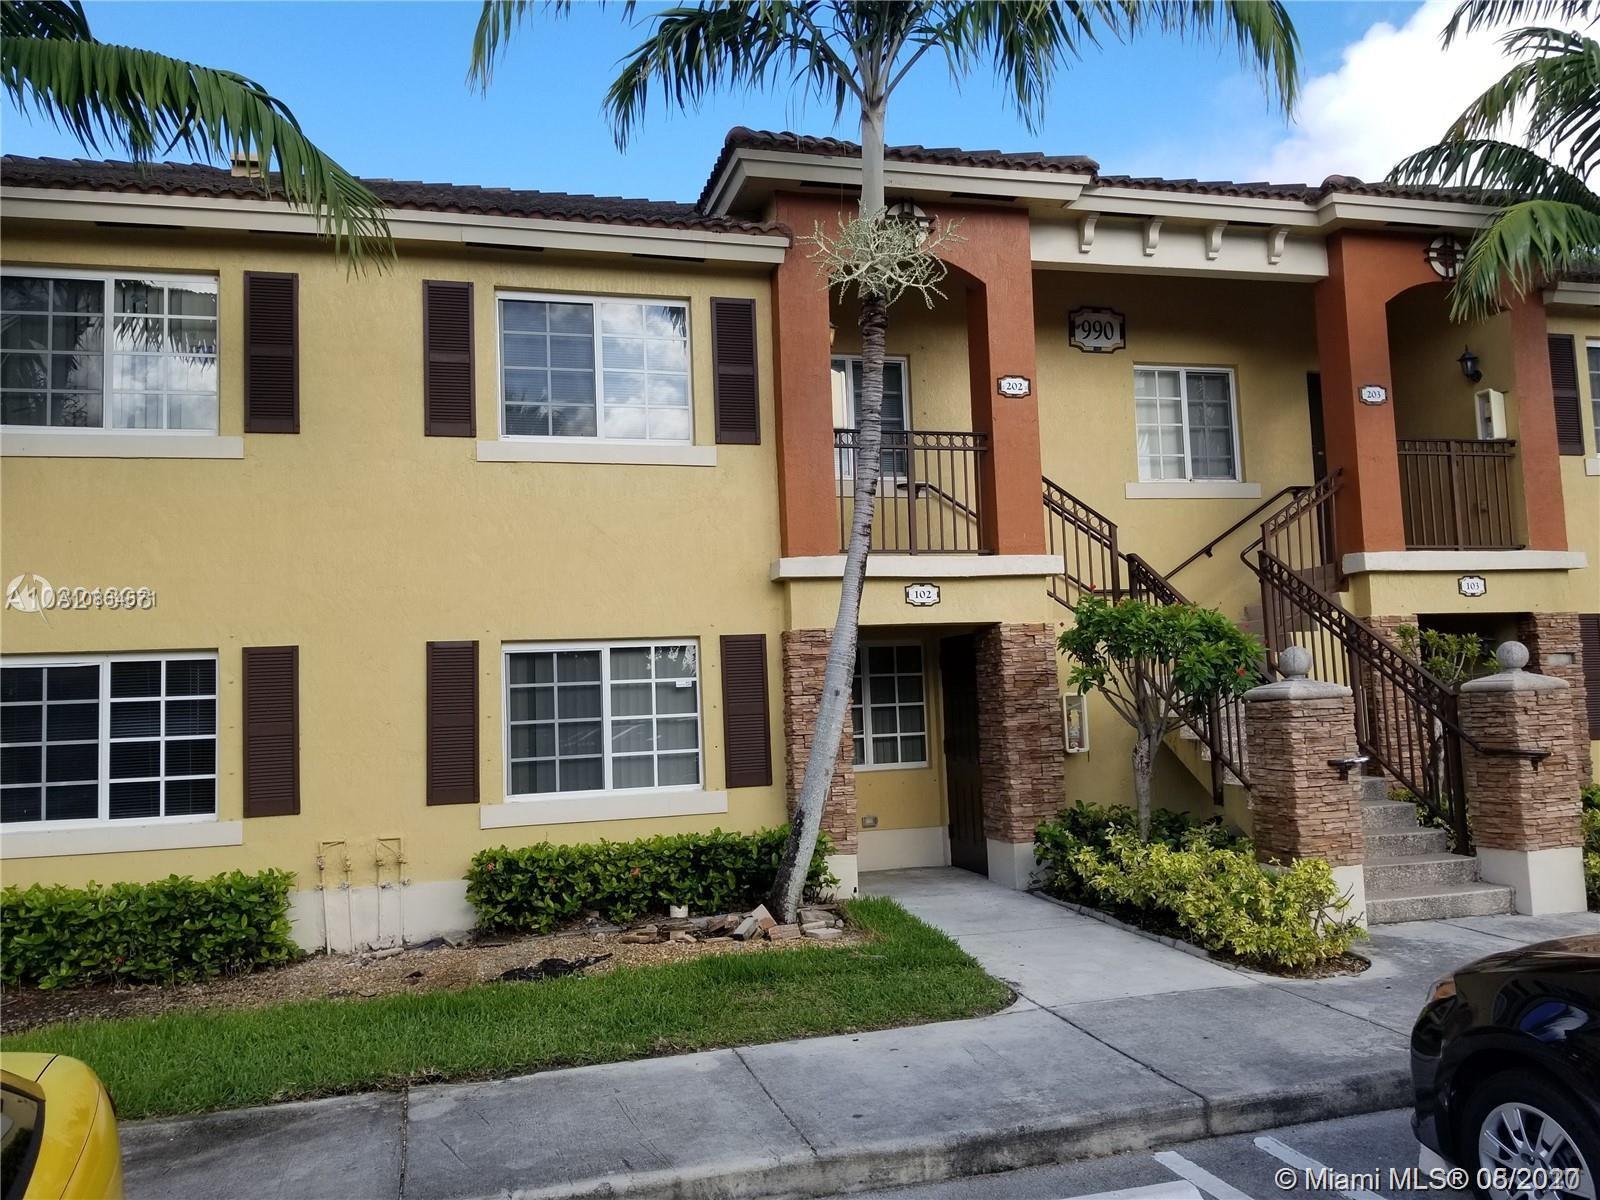 990 NE 33rd Ter #102, Homestead, FL 33033 - Homestead, FL real estate listing